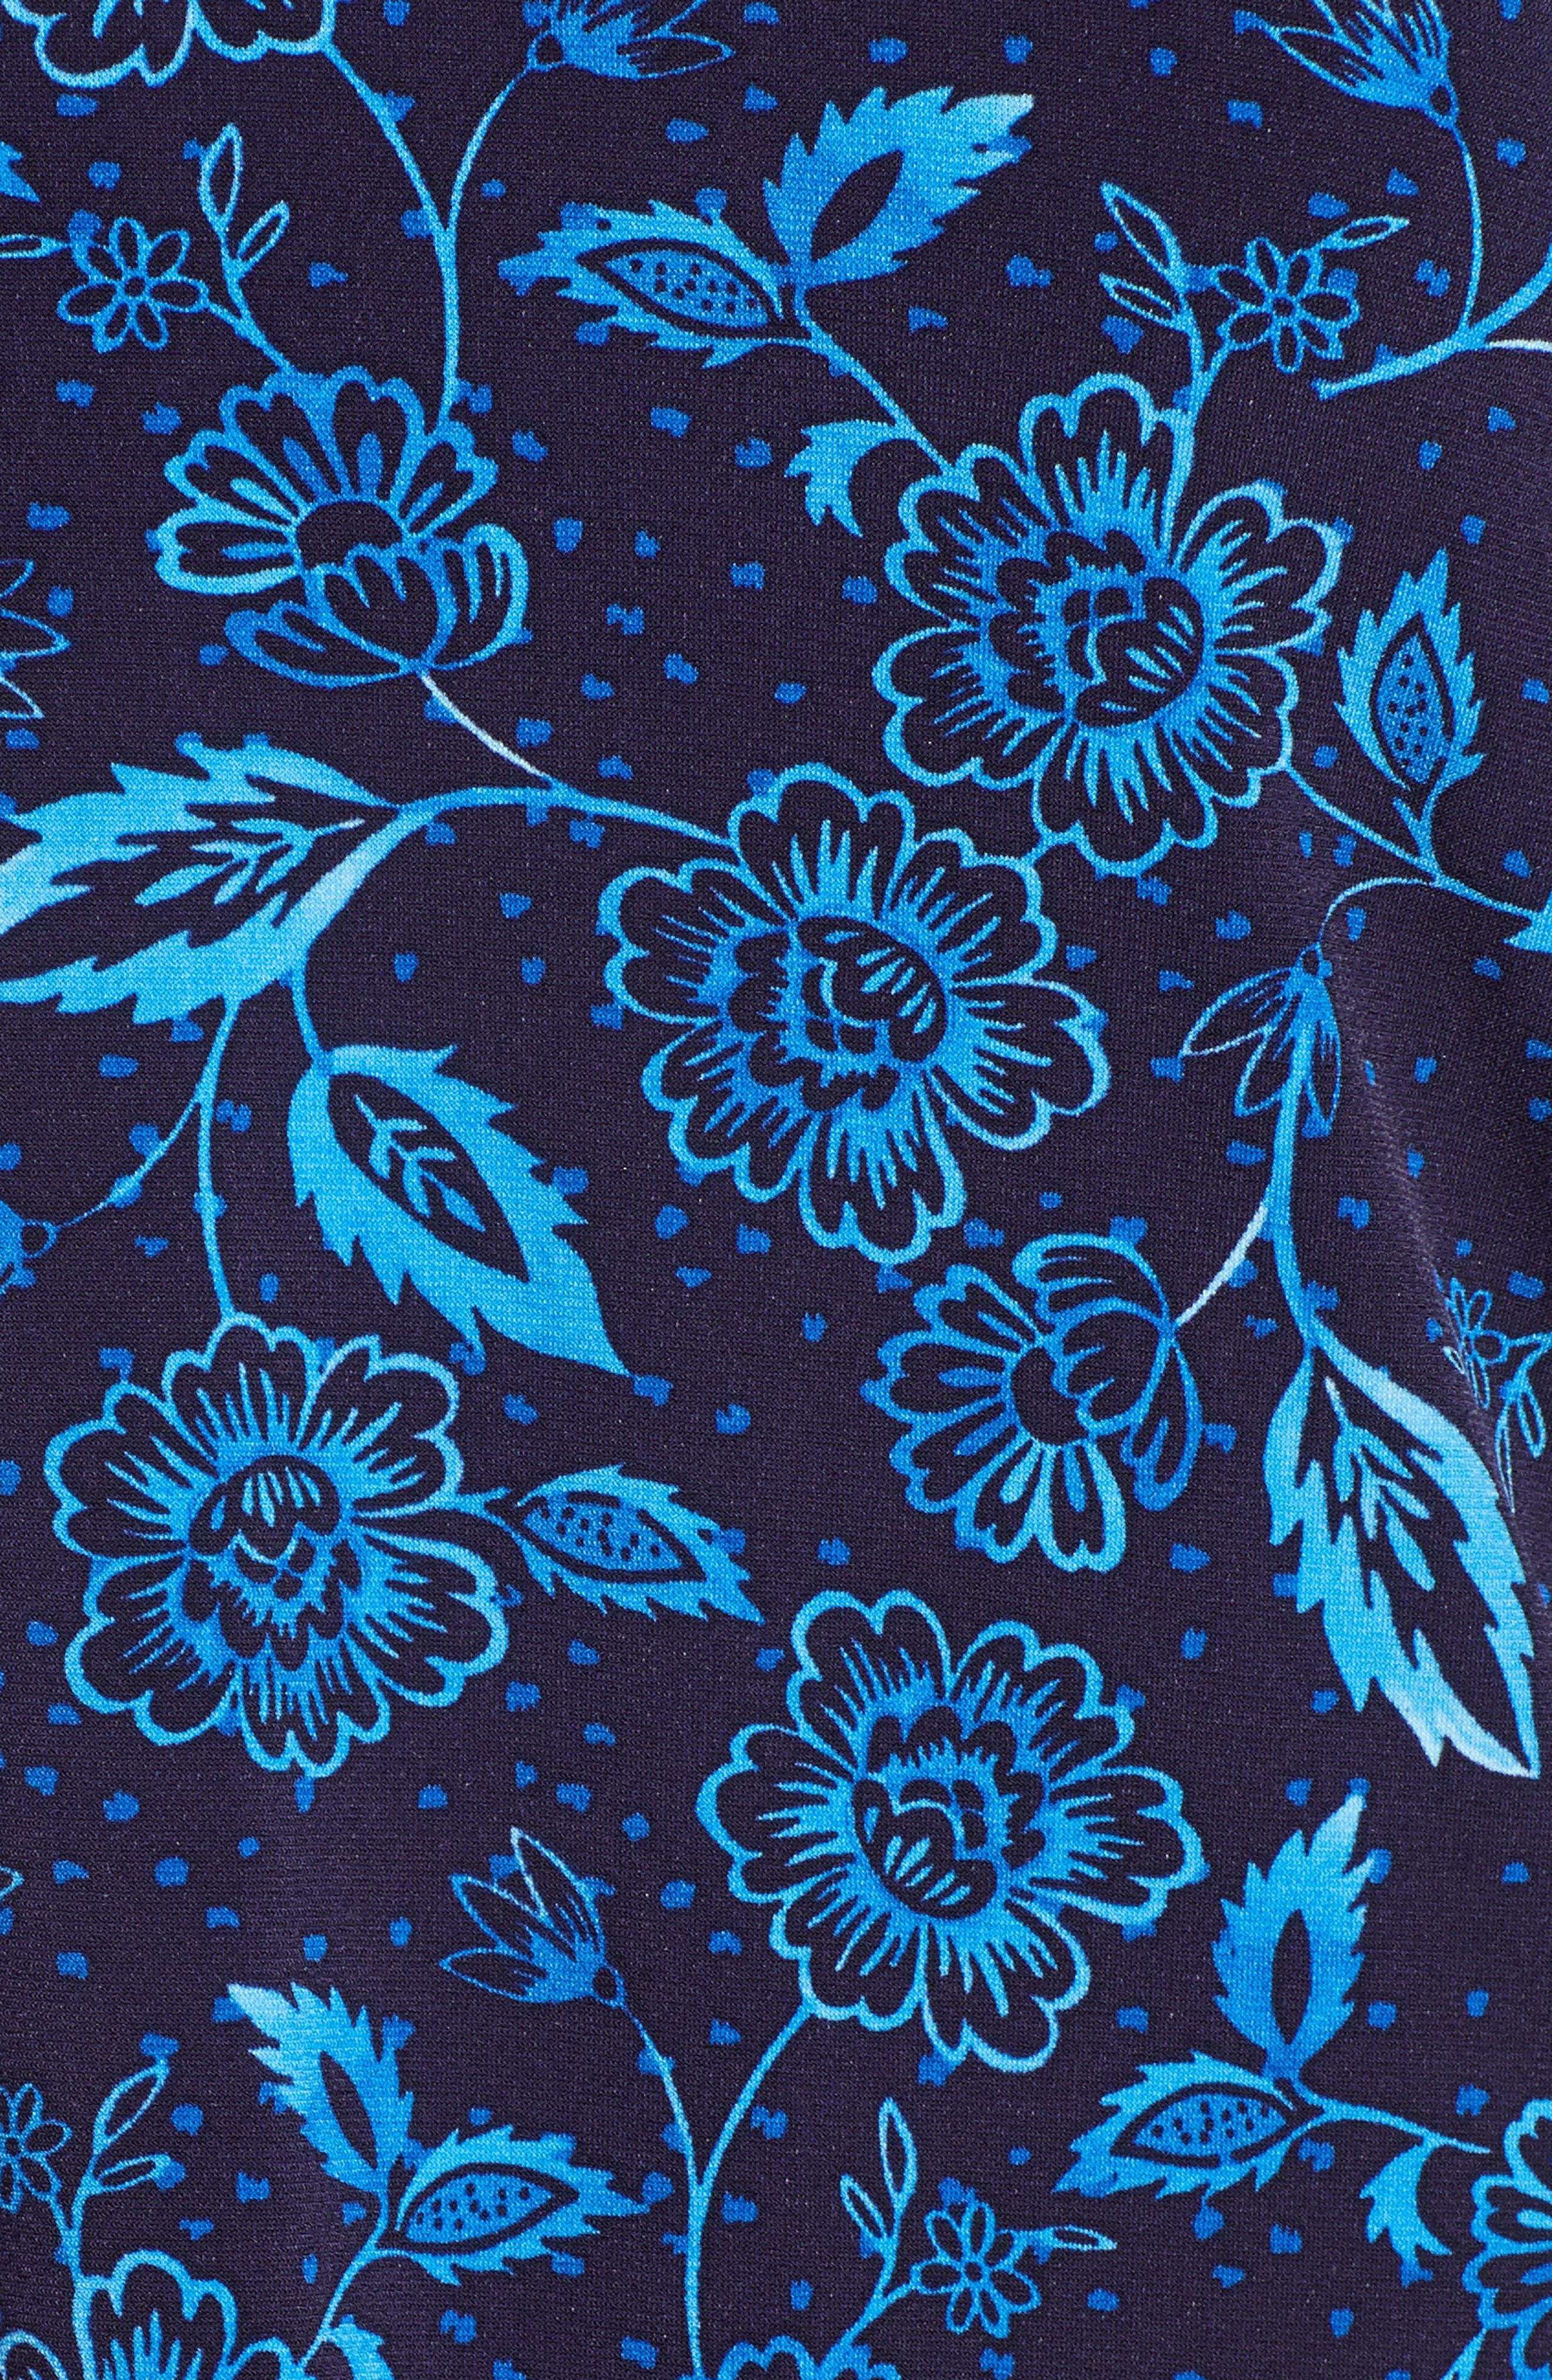 Flowering Vine Top,                             Alternate thumbnail 6, color,                             Evening Navy